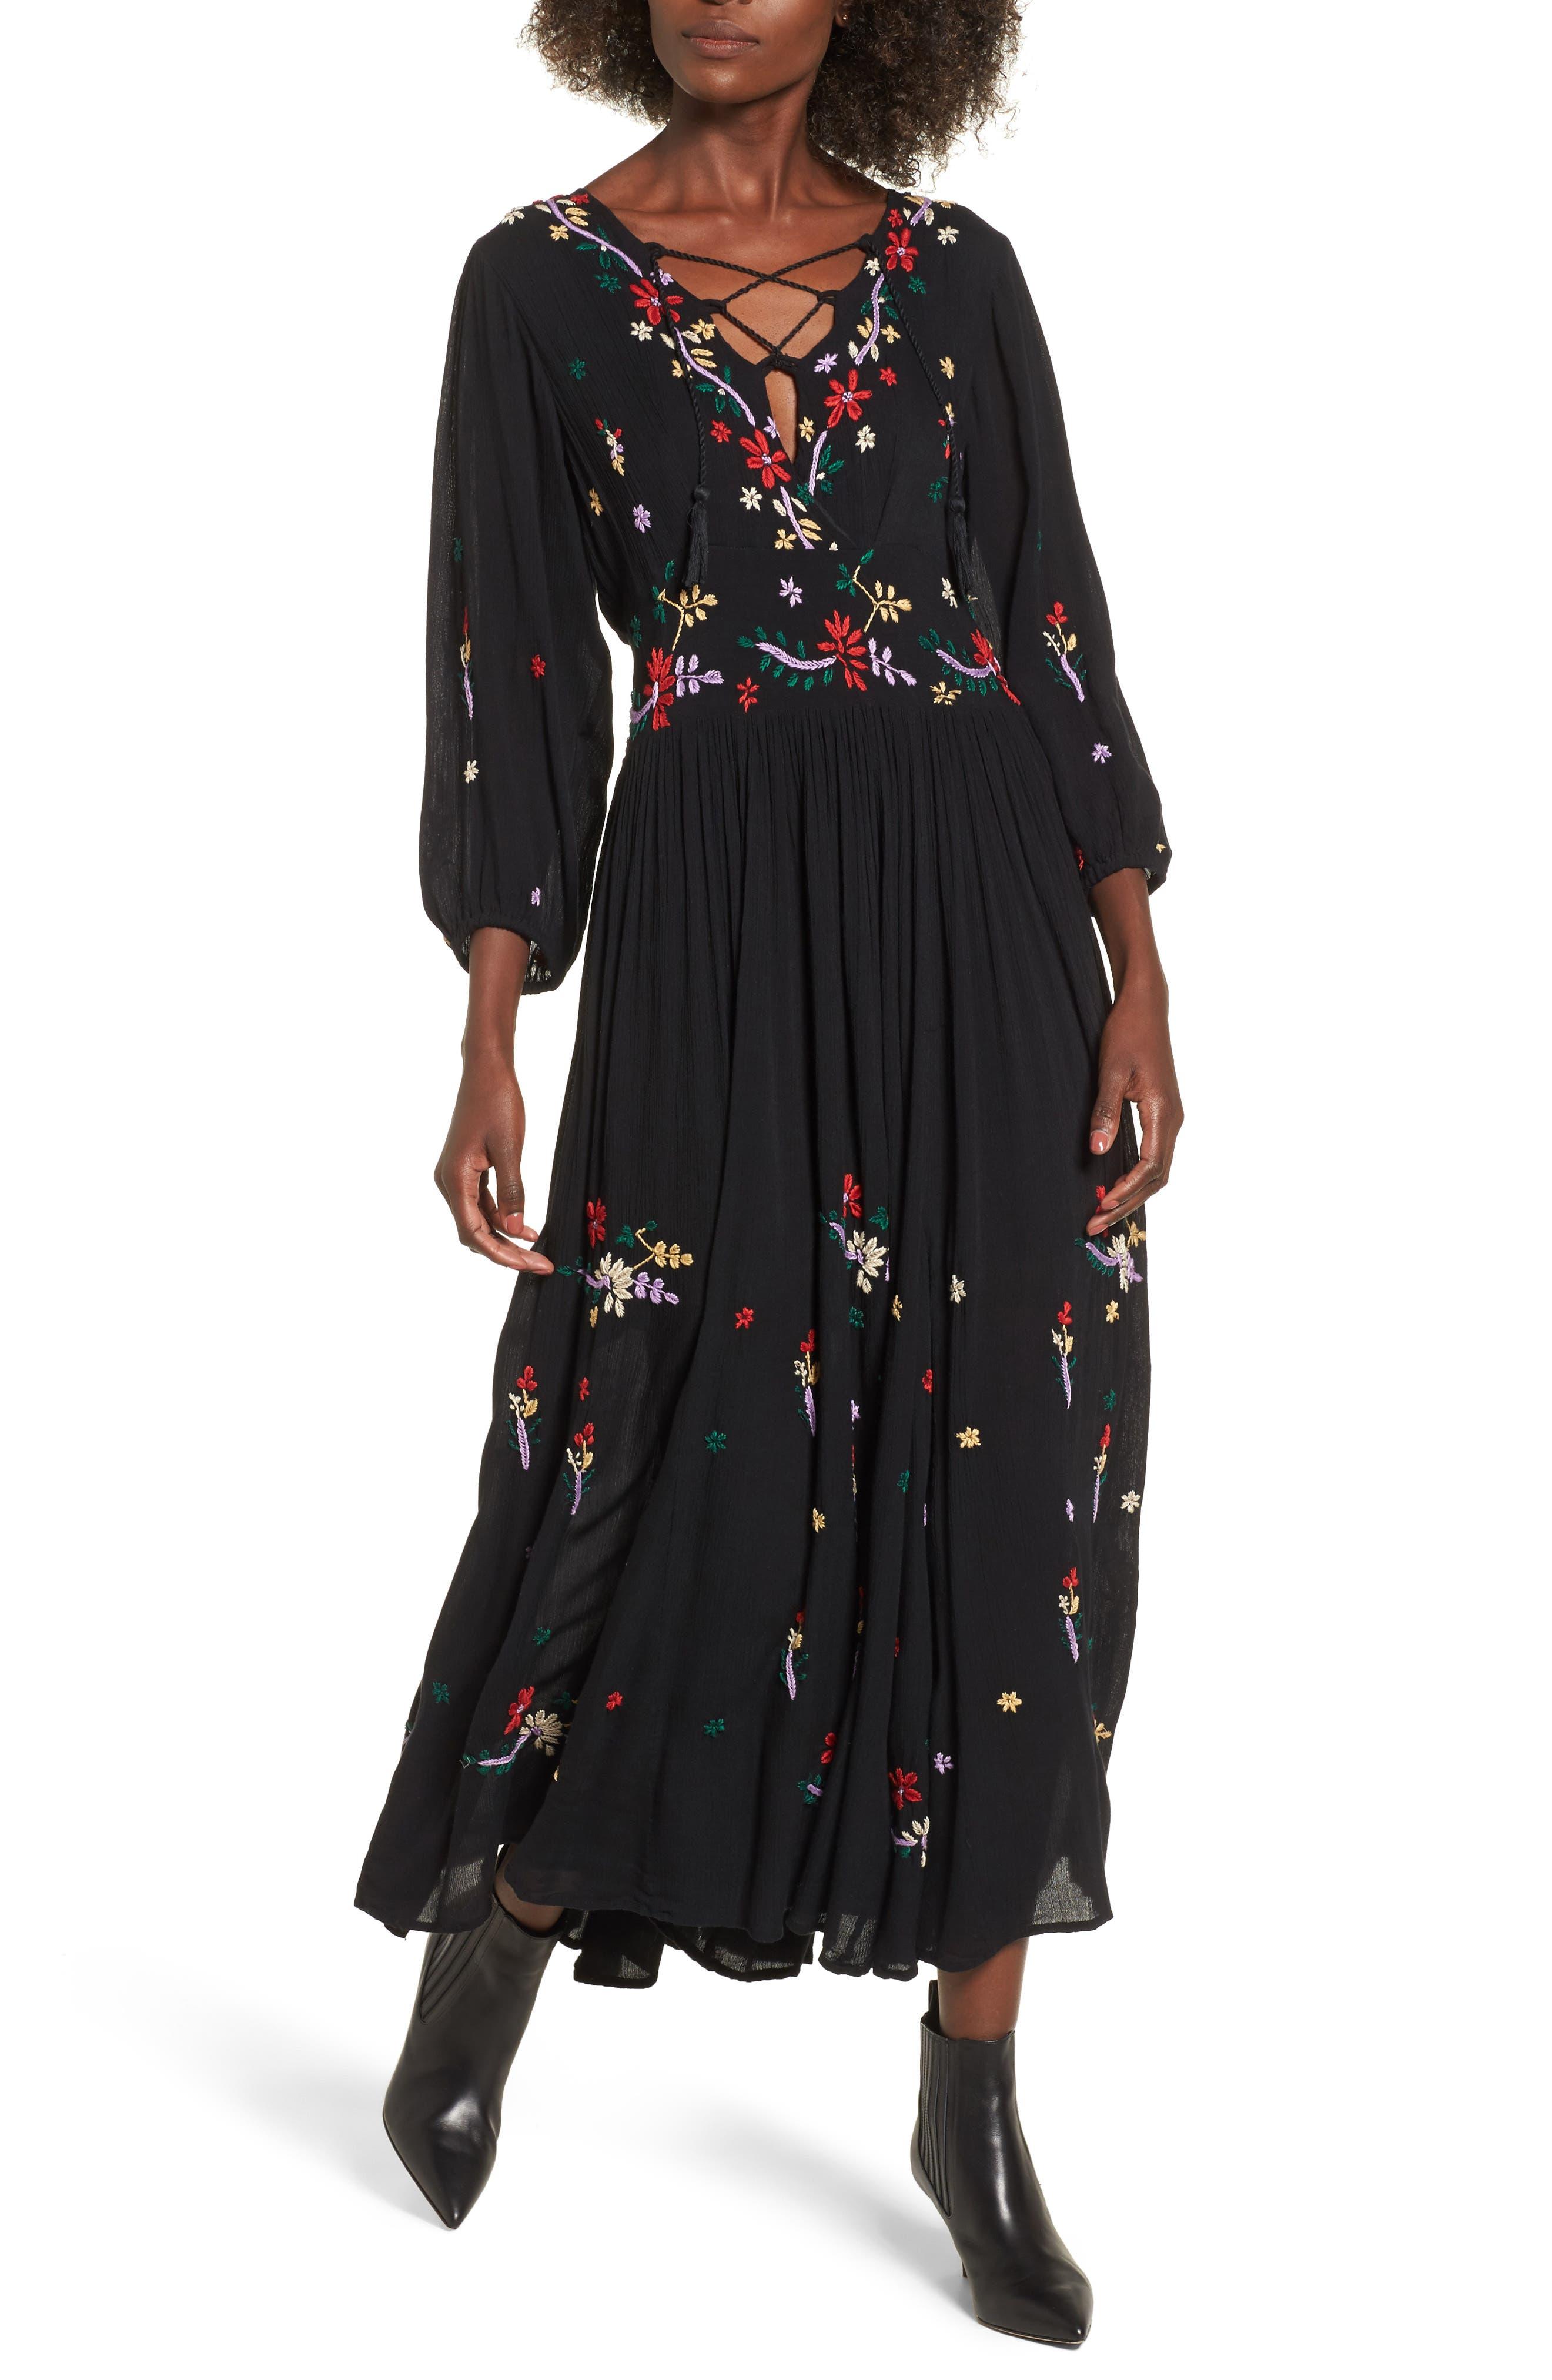 Alternate Image 1 Selected - Raga Sammy Embroidered Dress